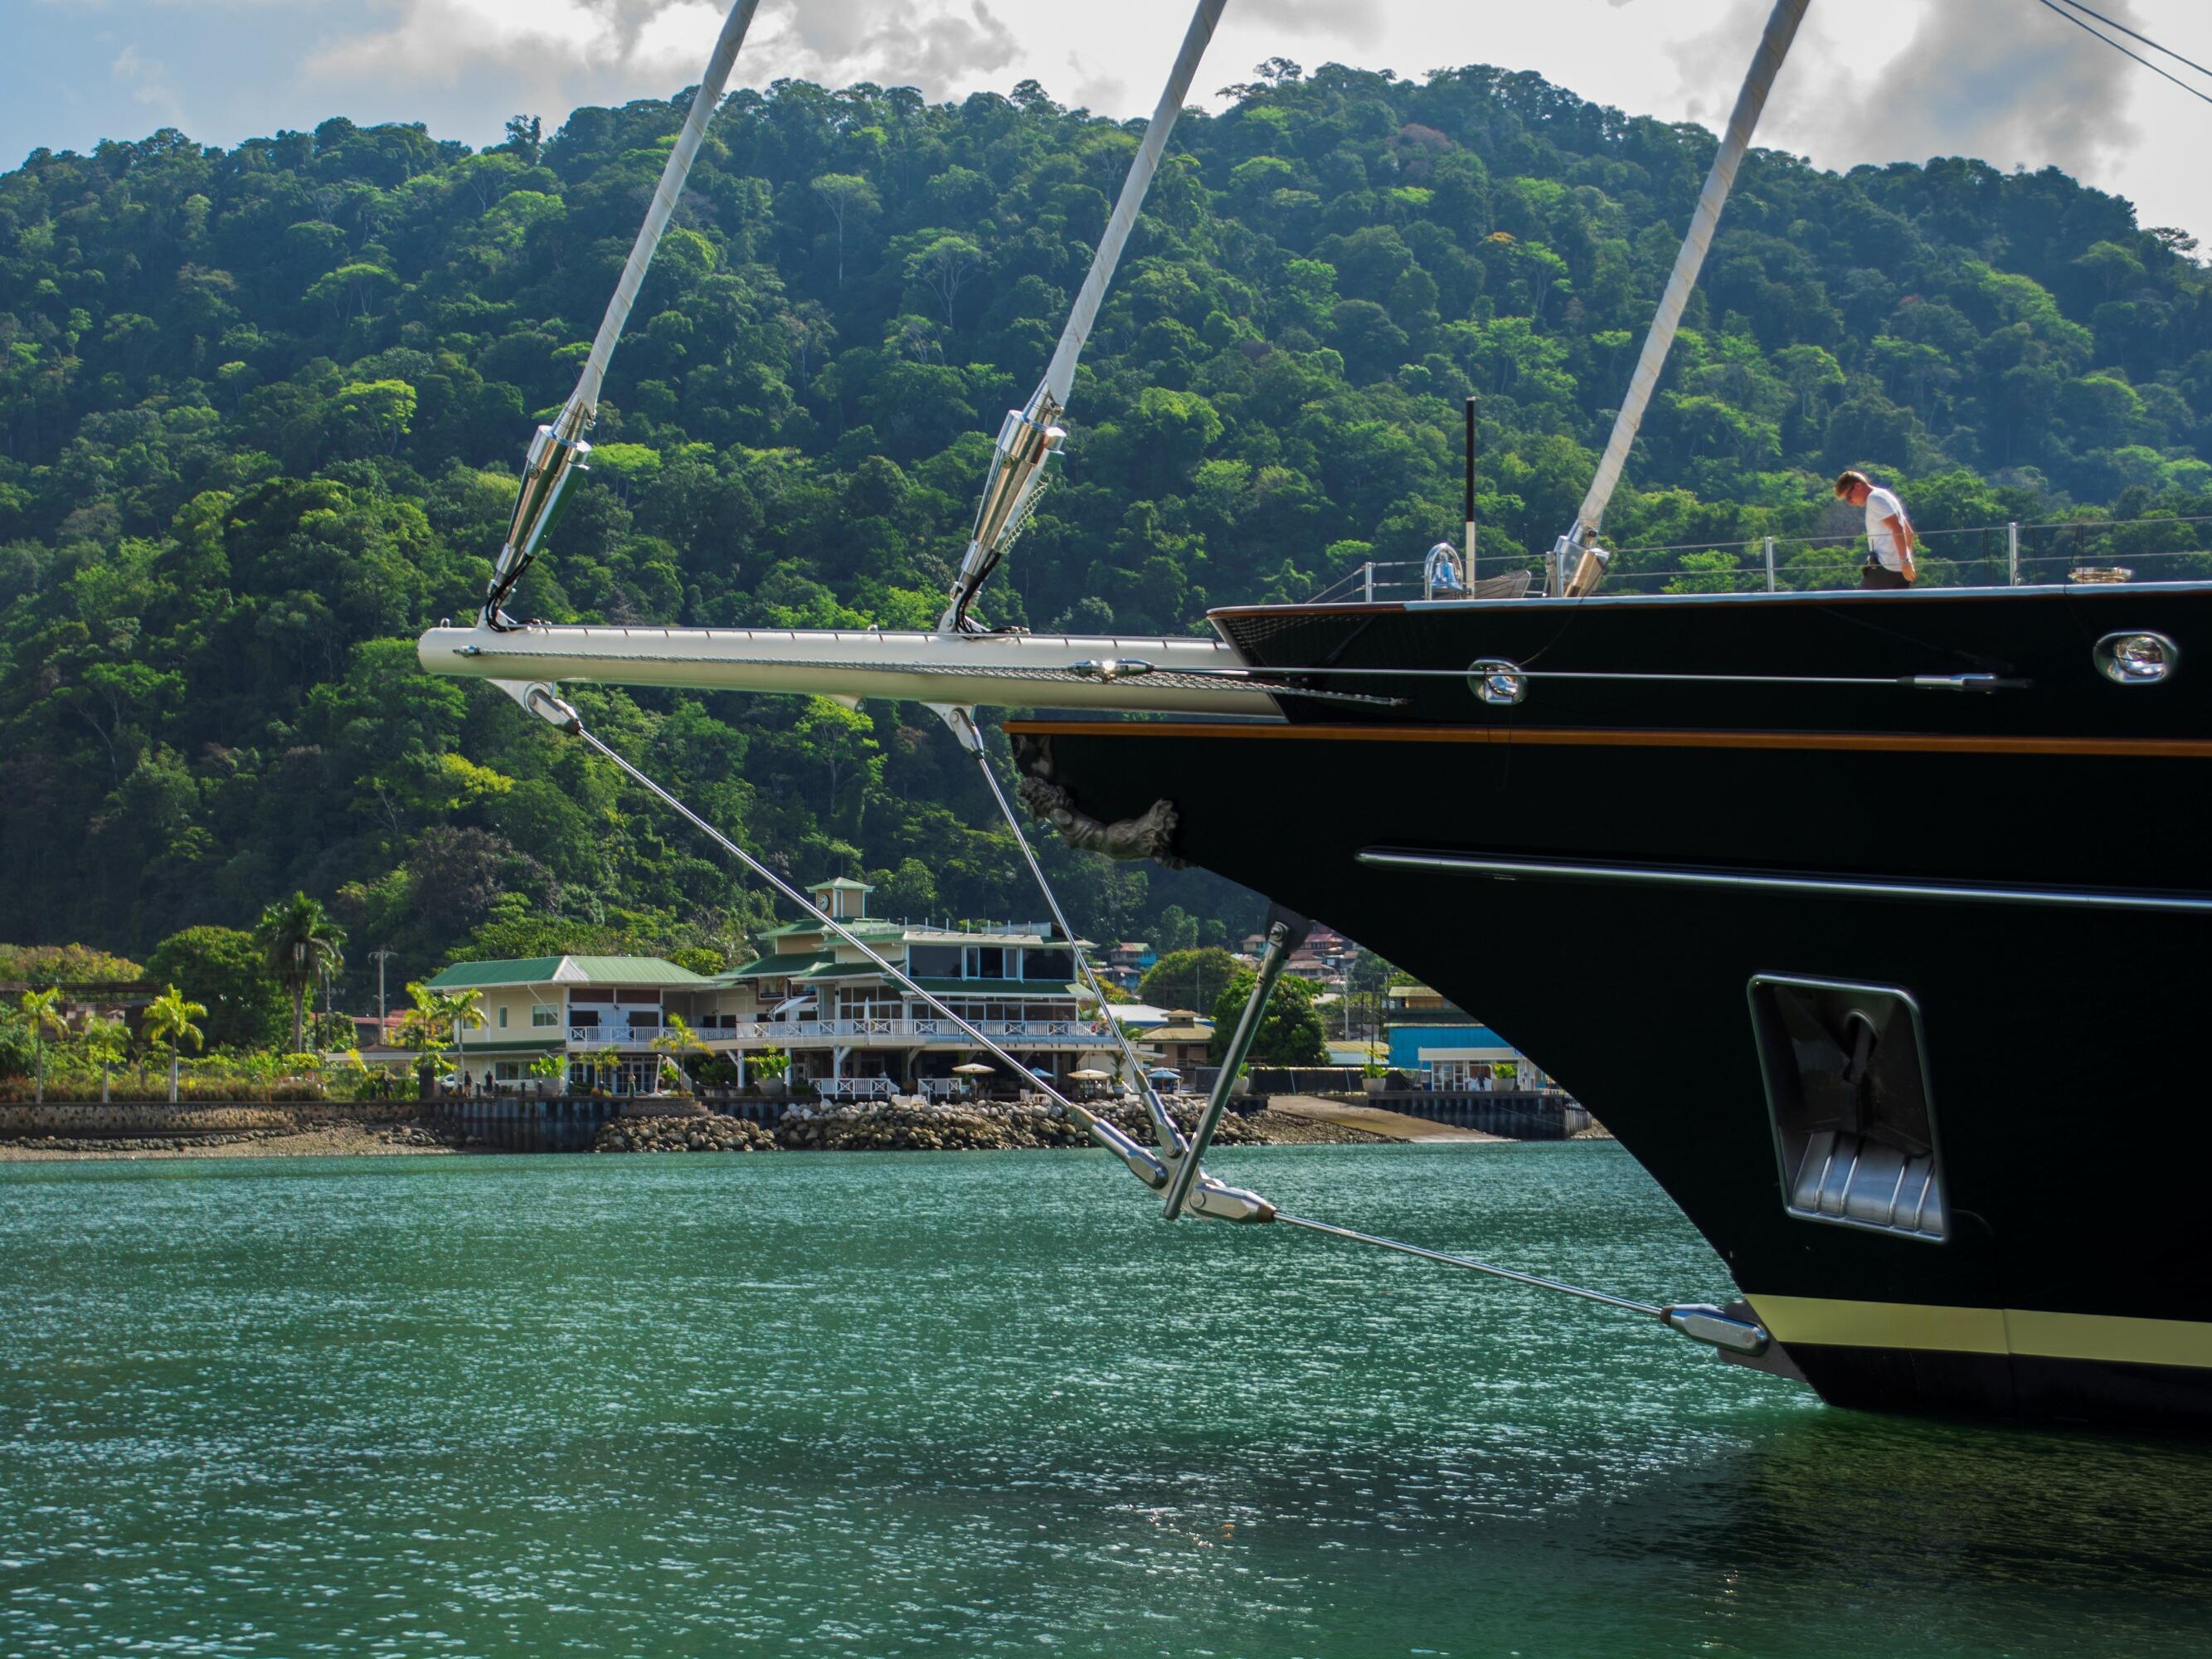 Pirate Ship sails on Amaka Ocean near Marina Bahia Golfito